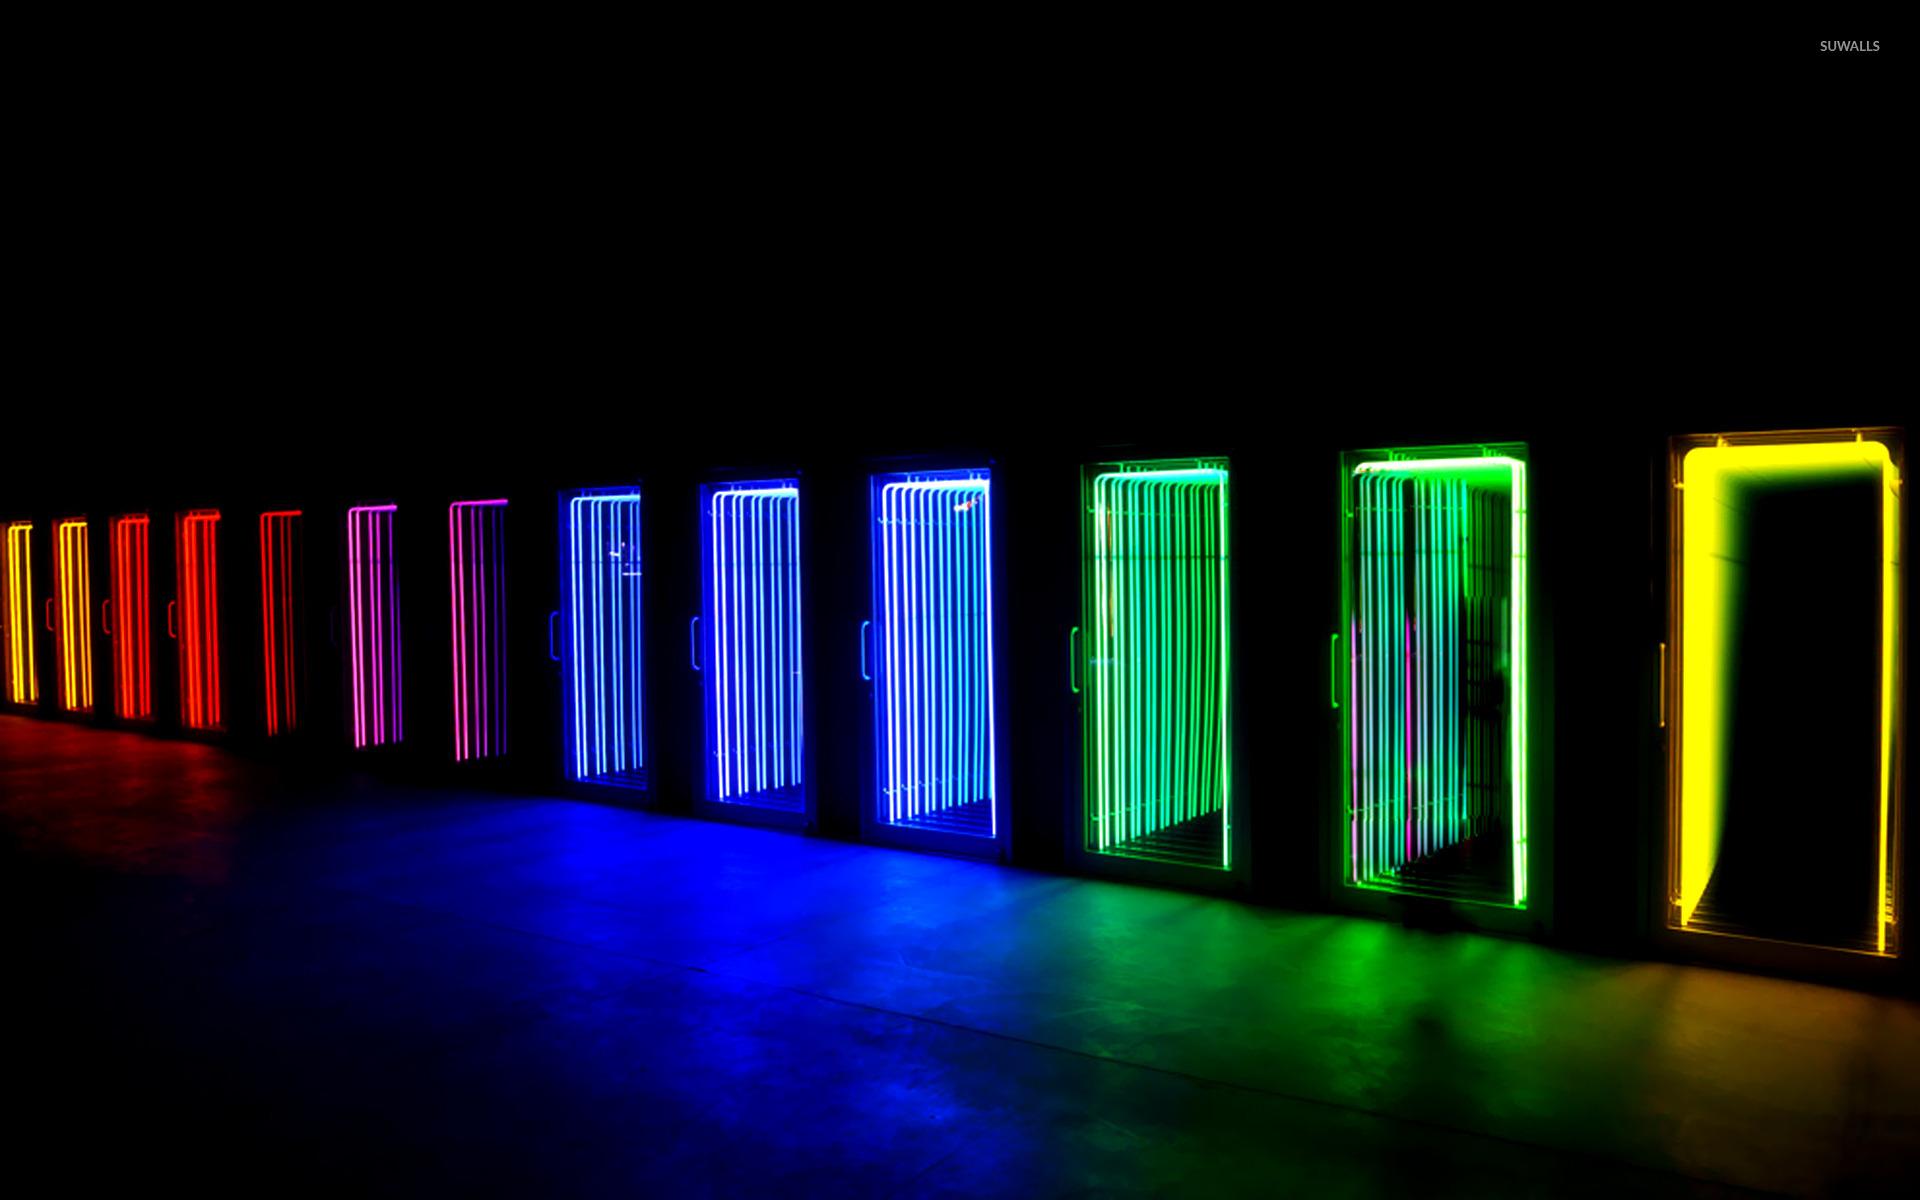 Colorful neon doors wallpaper  sc 1 st  SUWalls Desktop Wallpapers & Colorful neon doors wallpaper - Artistic wallpapers - #16413